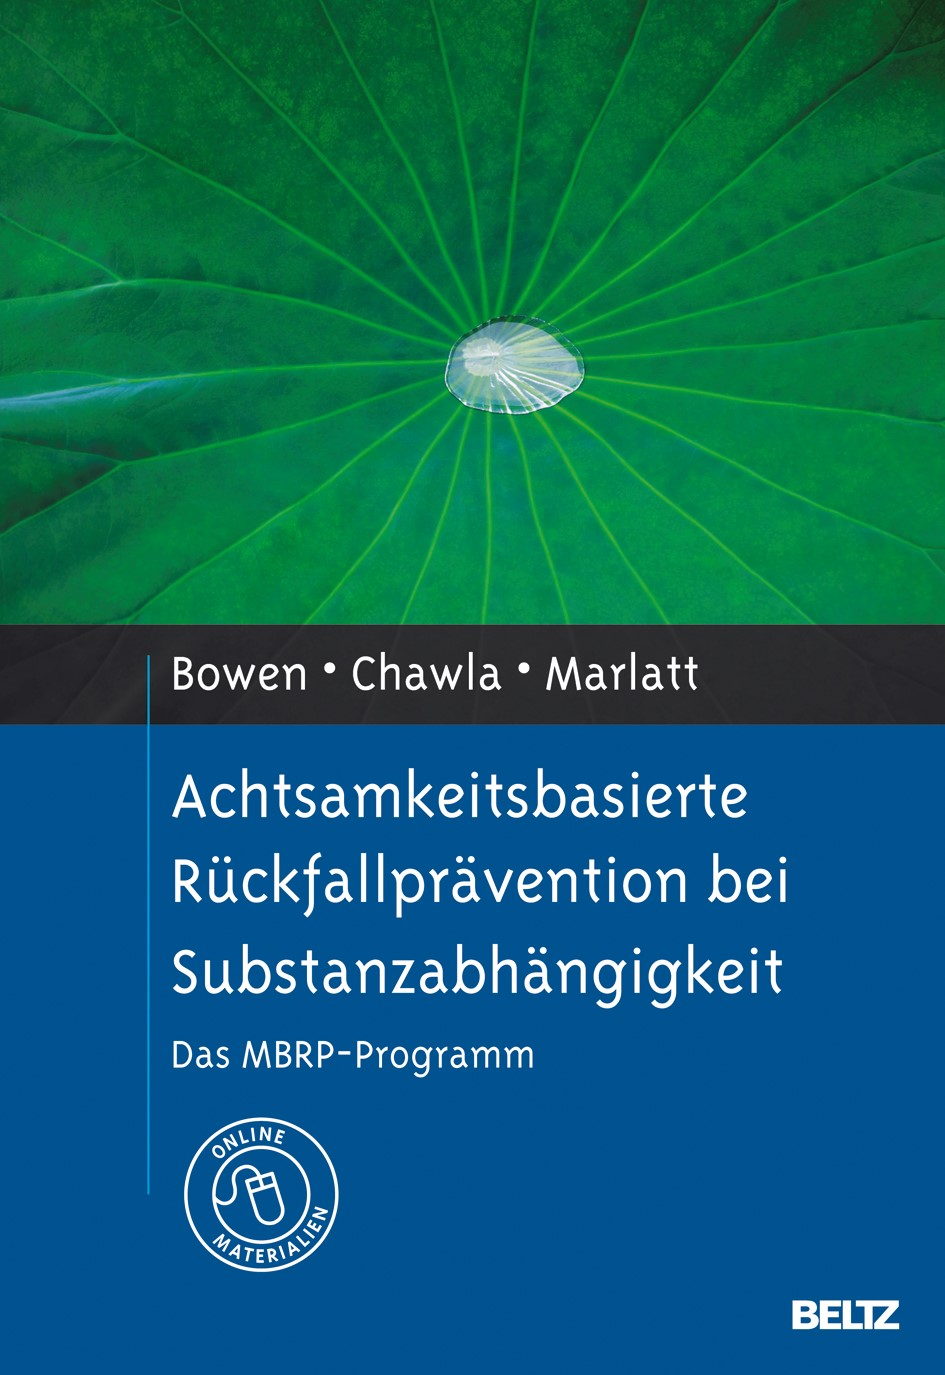 Achtsamkeitsbasierte Rückfallprävention bei Substanzabhängigkeit | Bowen / Chawla / Marlatt, 2012 | Buch (Cover)